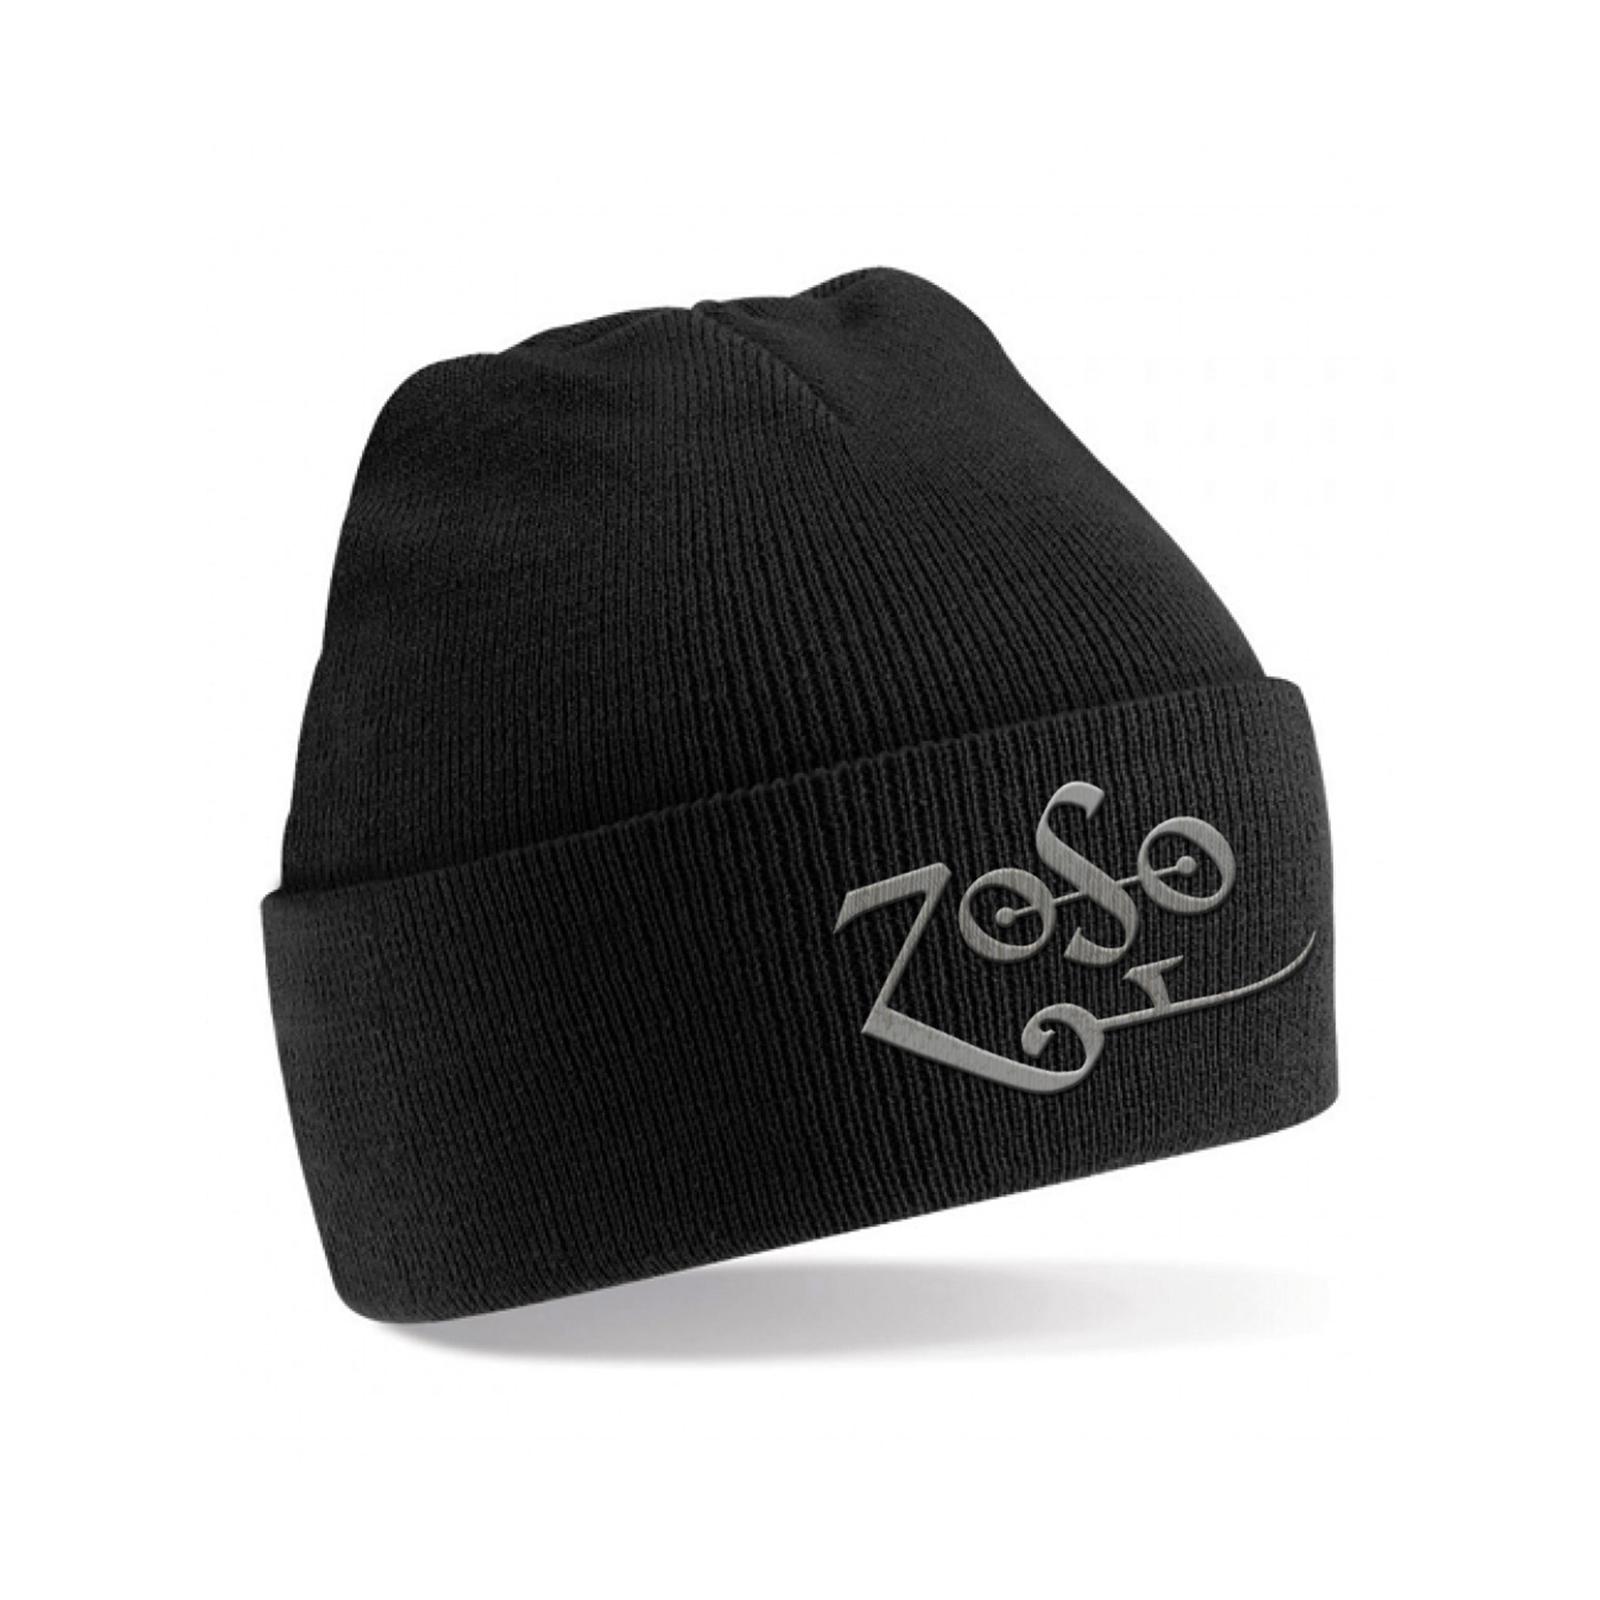 Black Zoso Beanie Hat